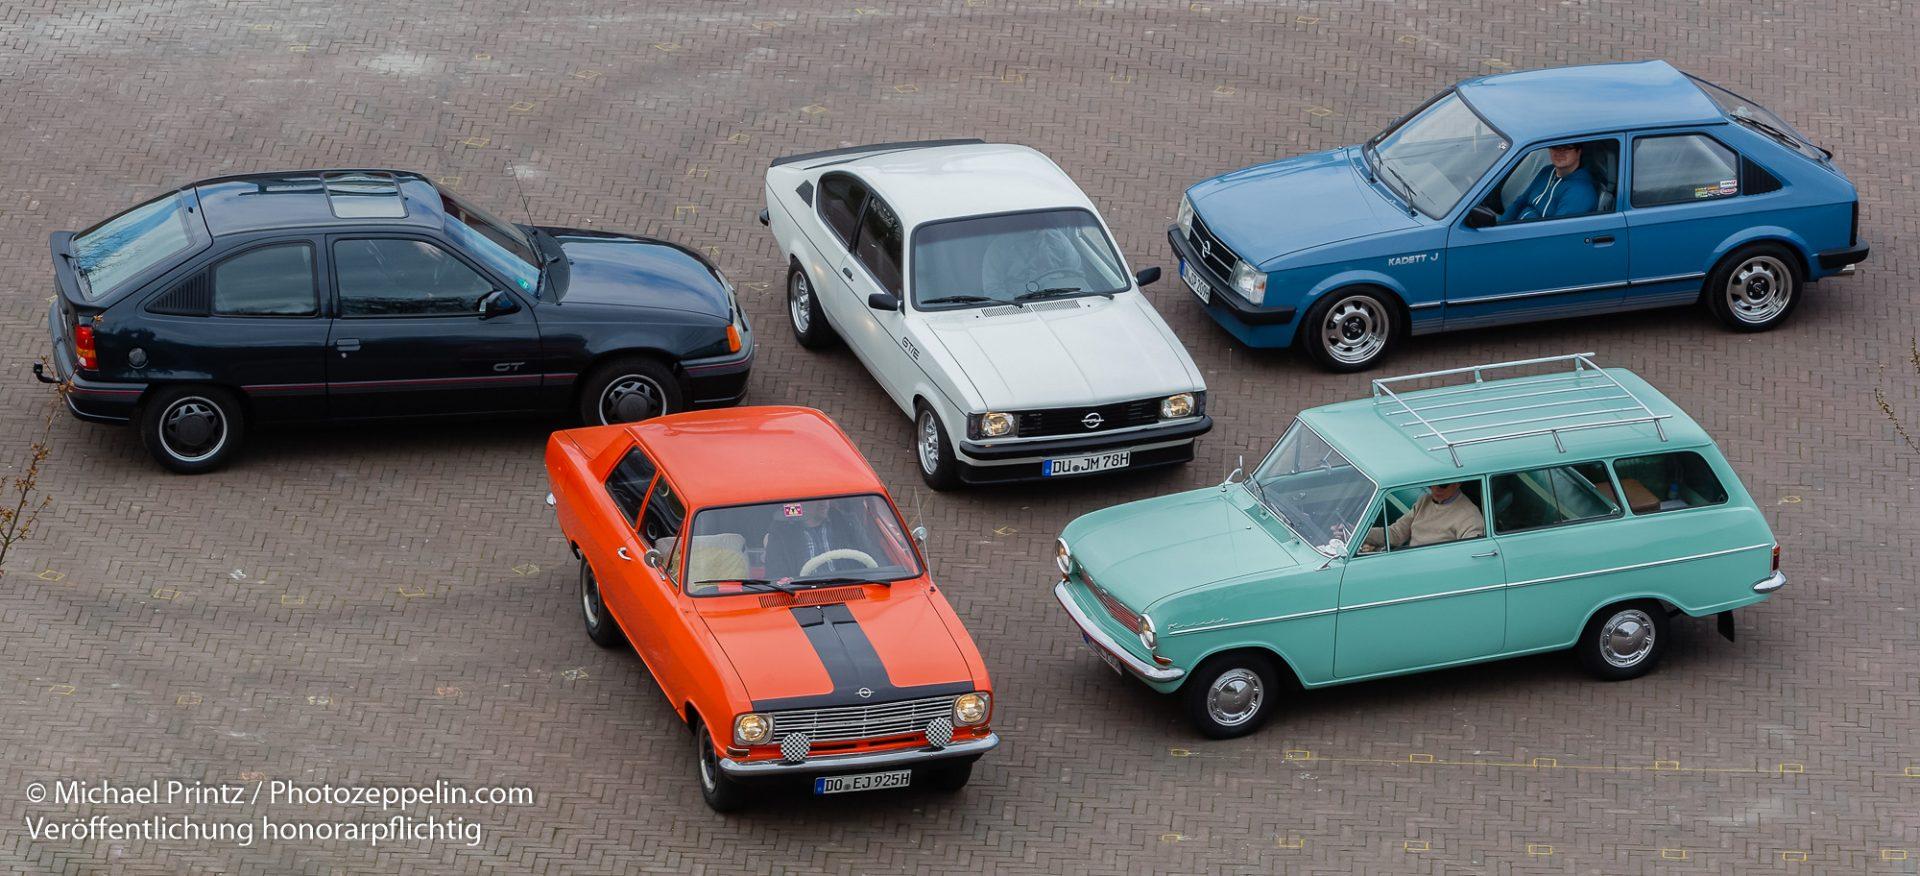 Auto Classic - Kadettenschule by Michael Printz.